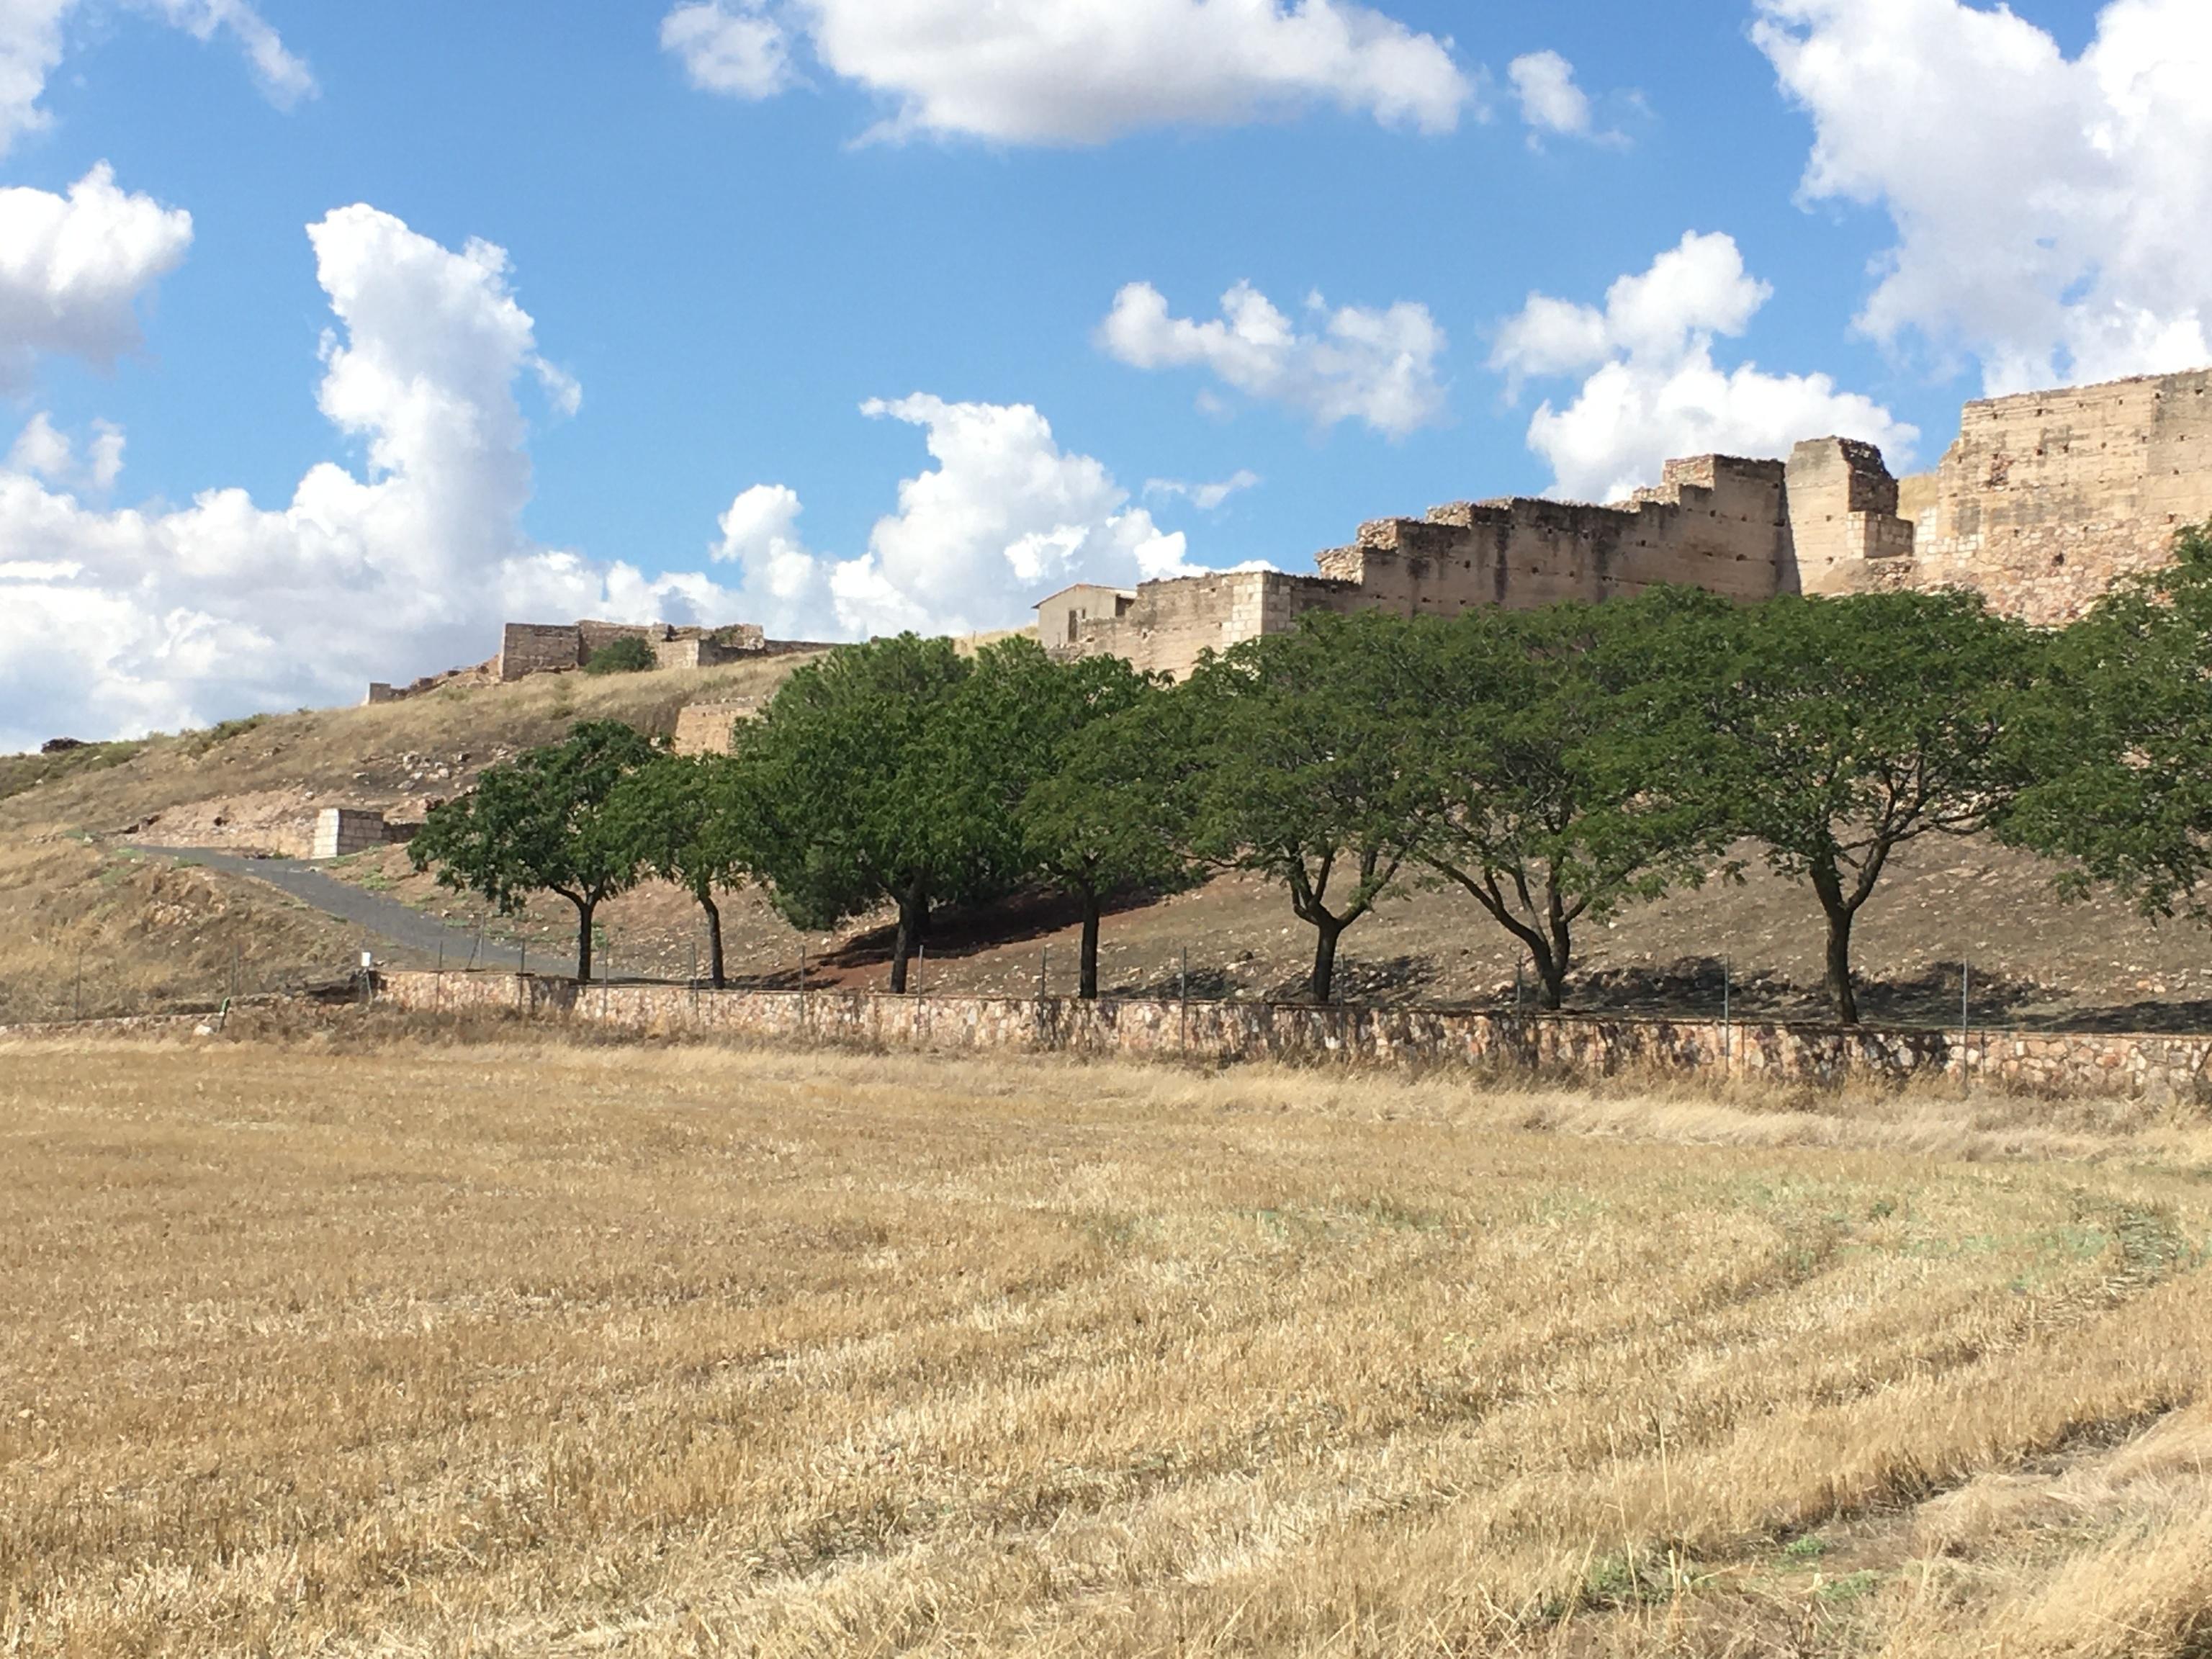 Vista del castillo de Alarcos.